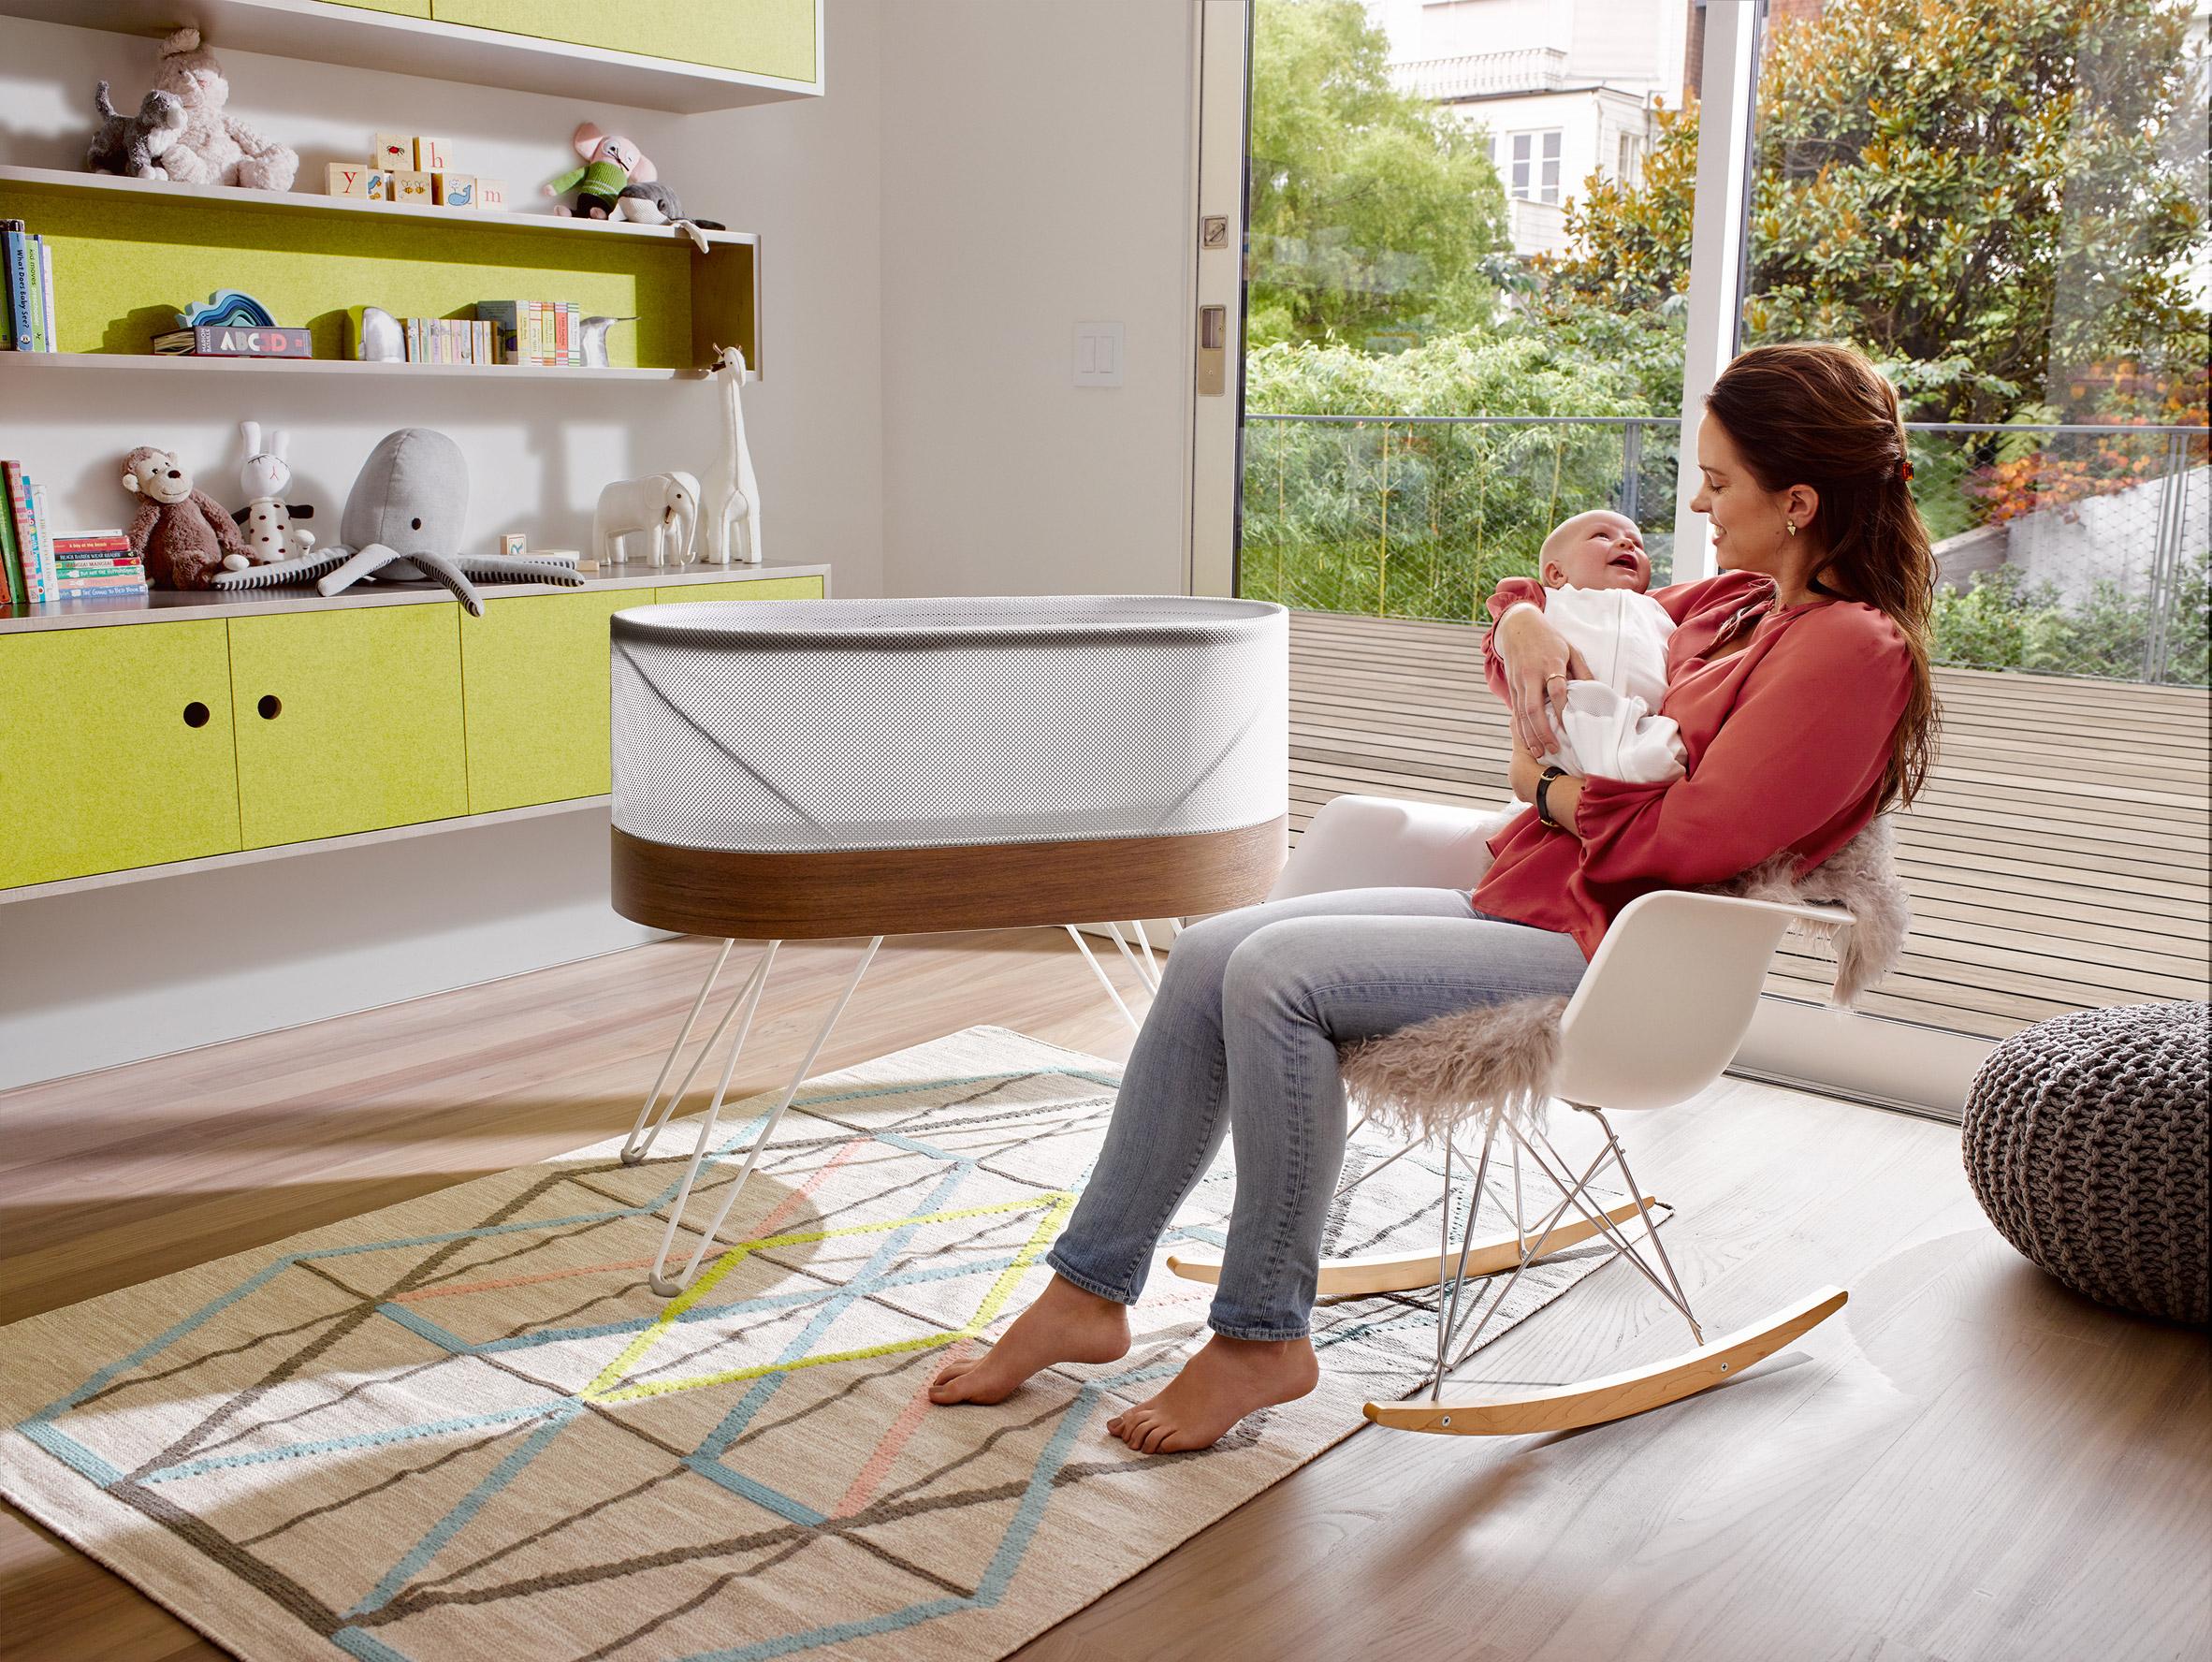 Yves Behar's robotic Snoo crib rocks babies to sleep itself